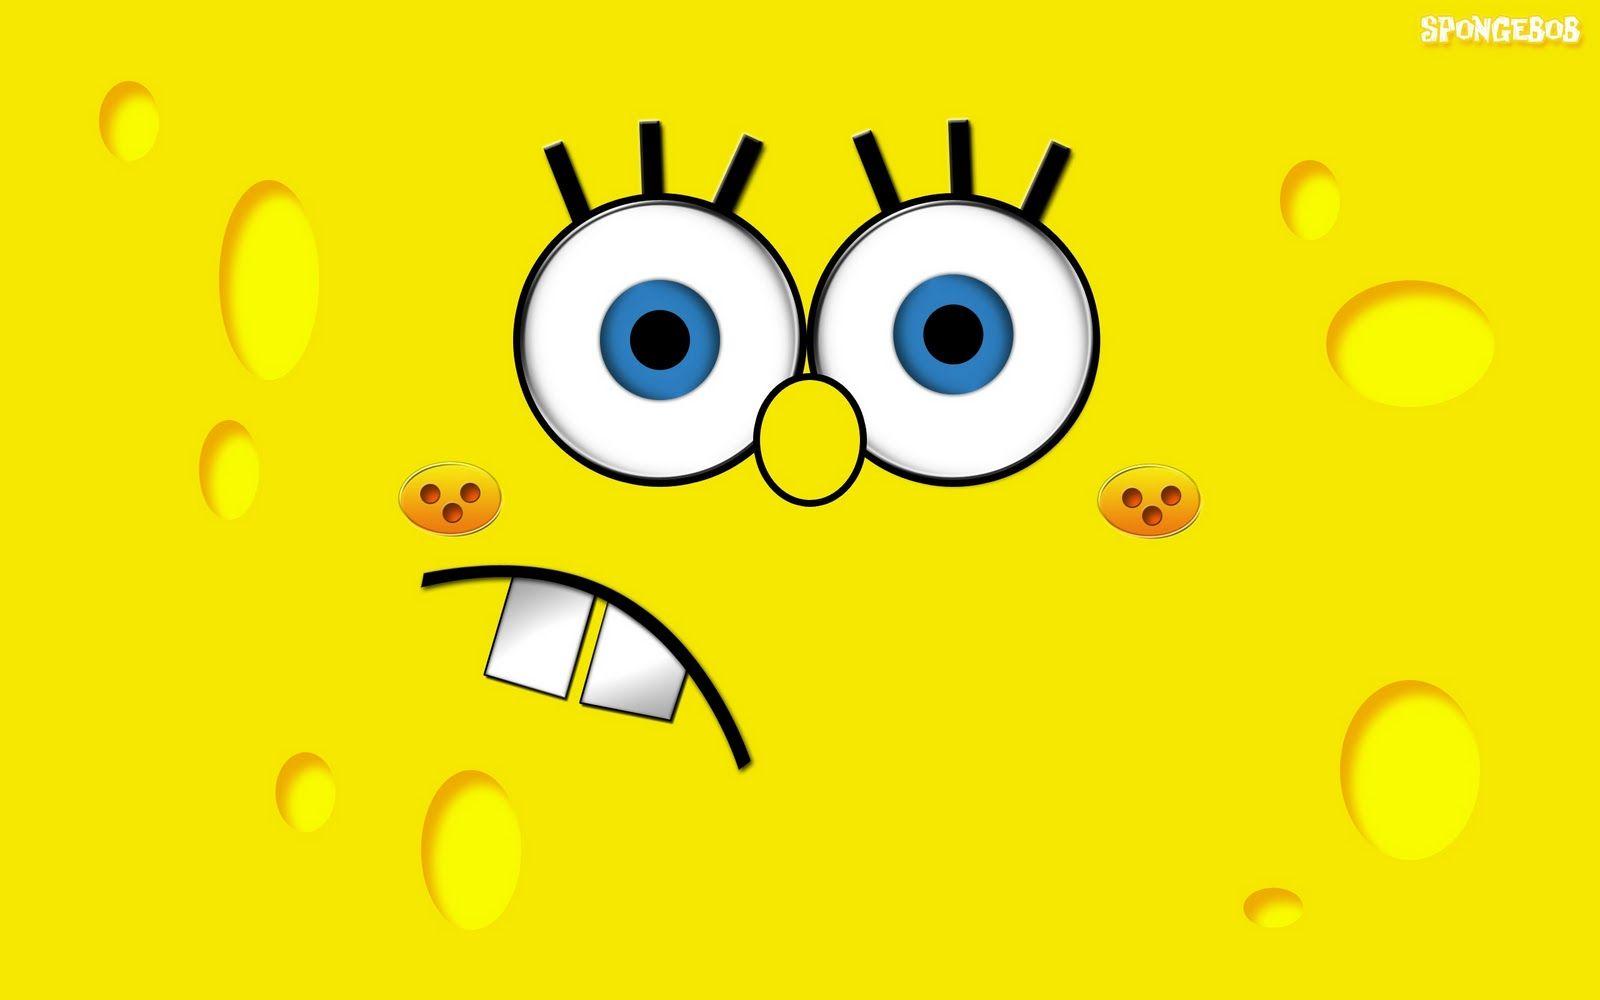 Yellow Spongebob Wallpaper Cartoon Wallpaper Funny Wallpaper